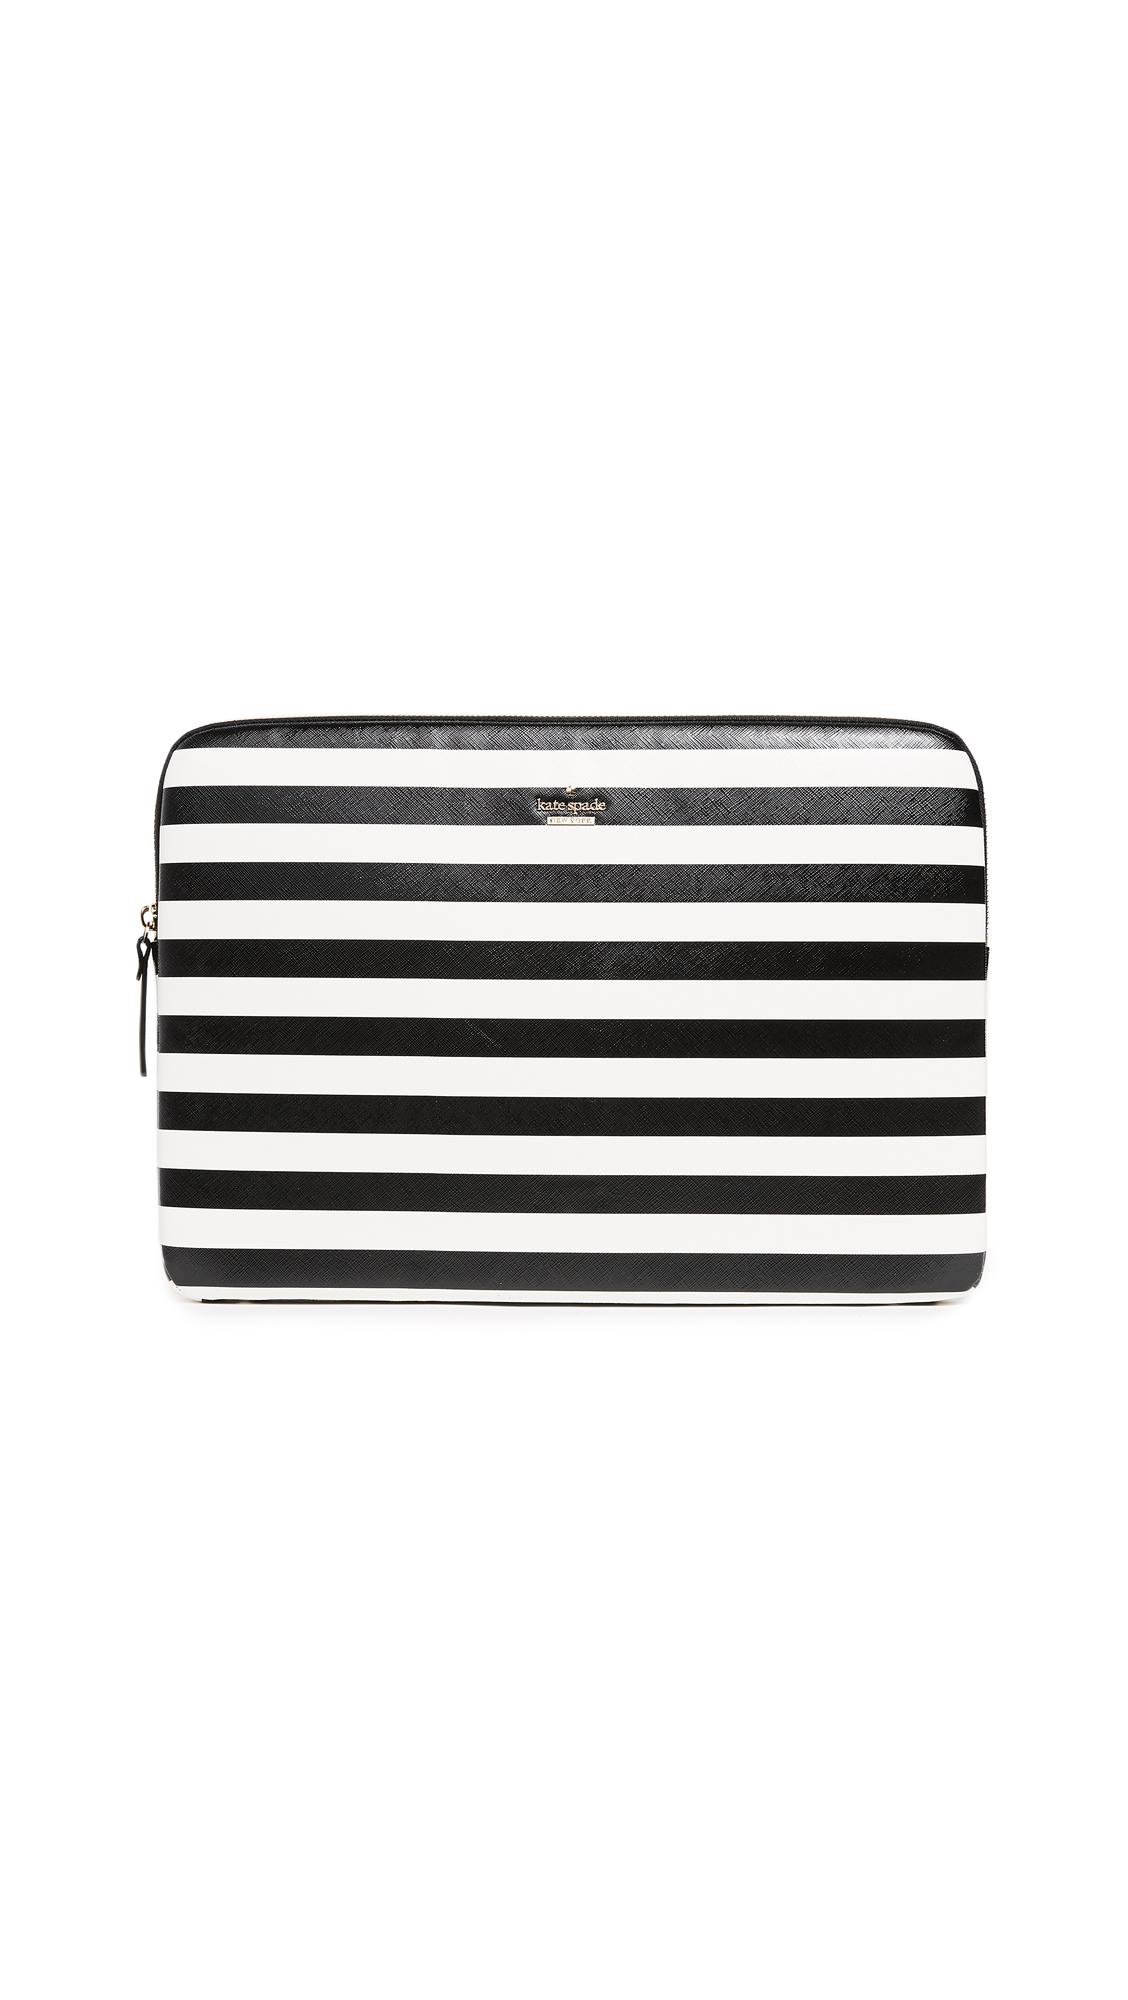 Kate Spade New York Laptop Sleeve - Black/Cream